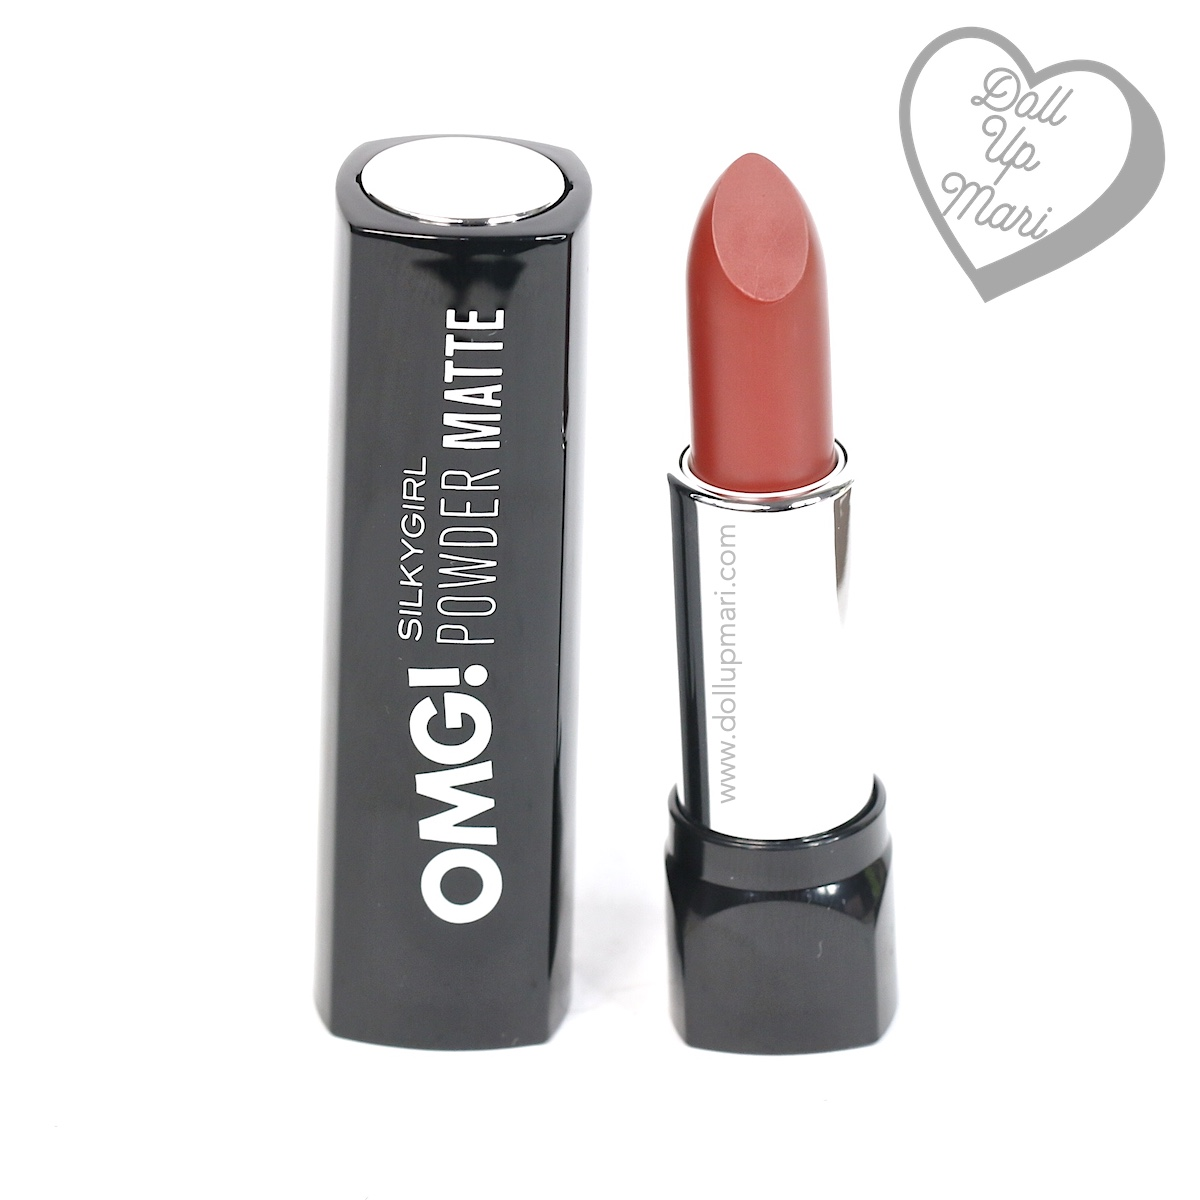 pack shot of Silkygirl OMG! Powder Matte Lipcolor Lipstick (04-Maroon)